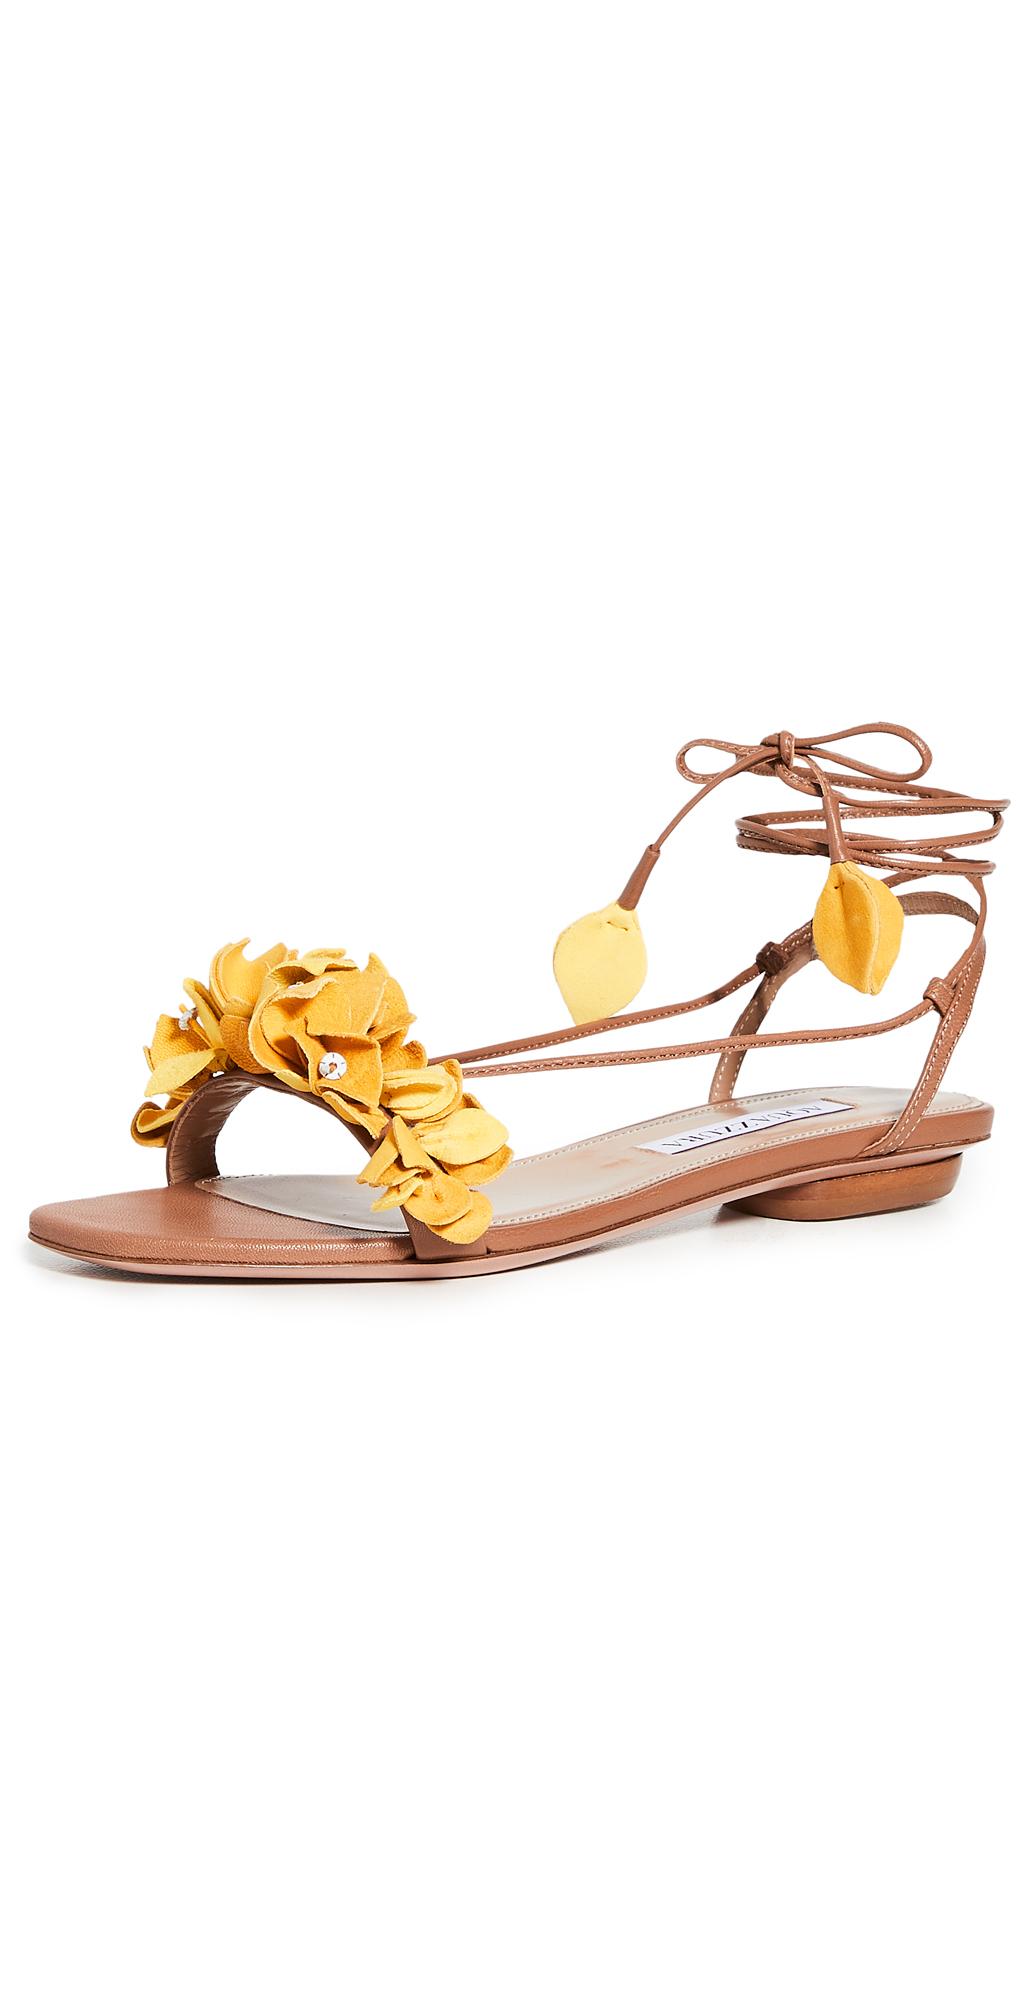 Aquazzura Bougainvillea Laced Flat Sandals